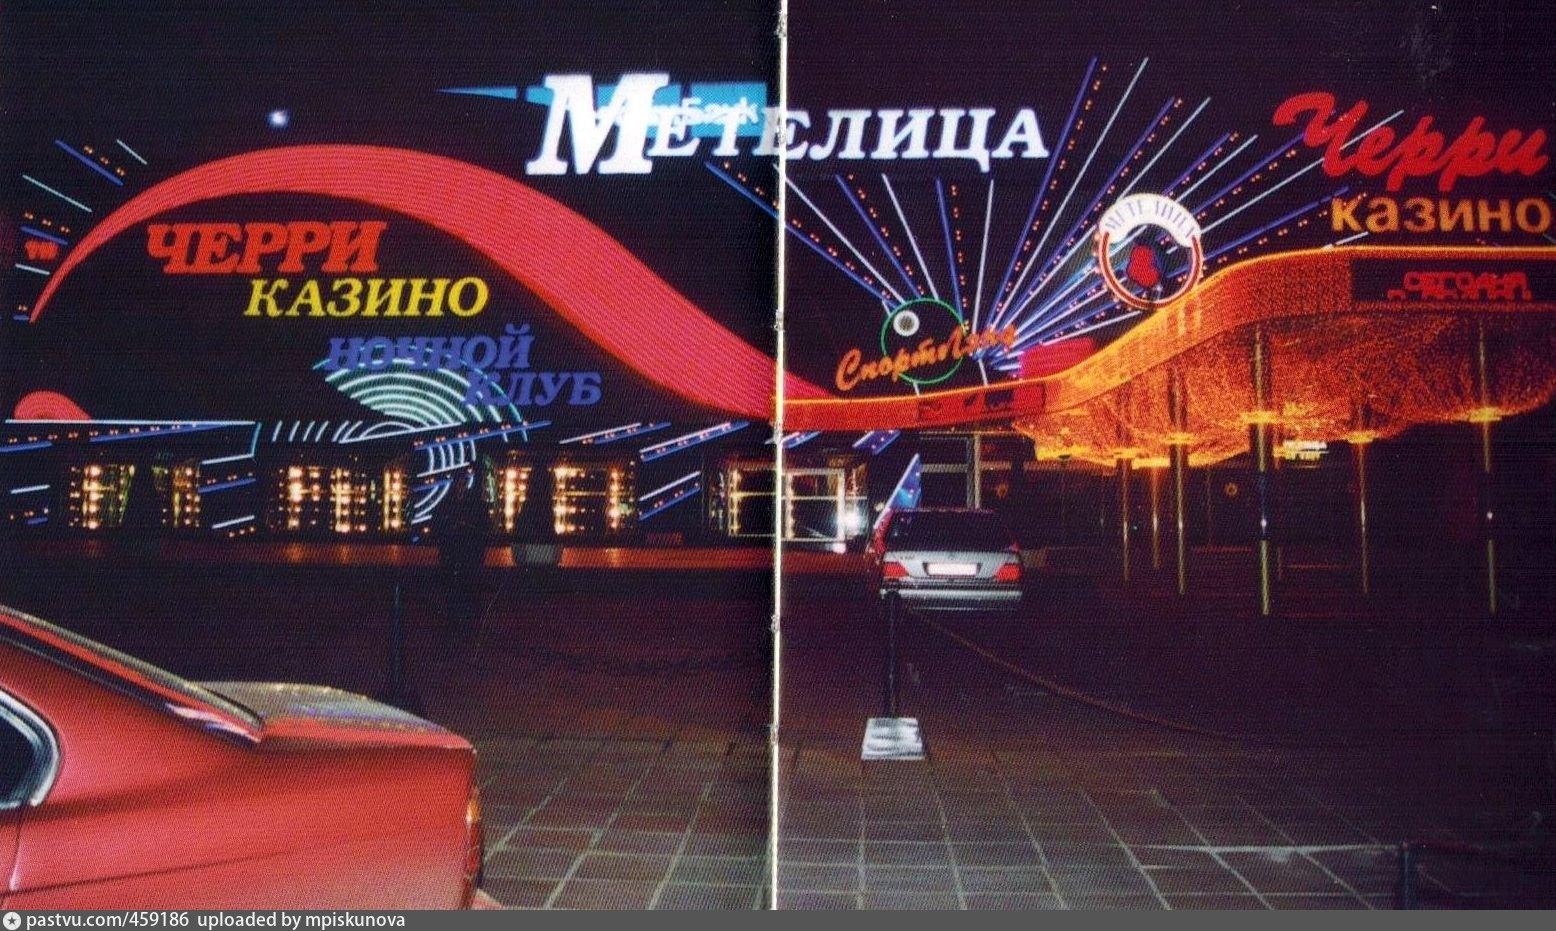 казино метелица москва в 90 х адрес